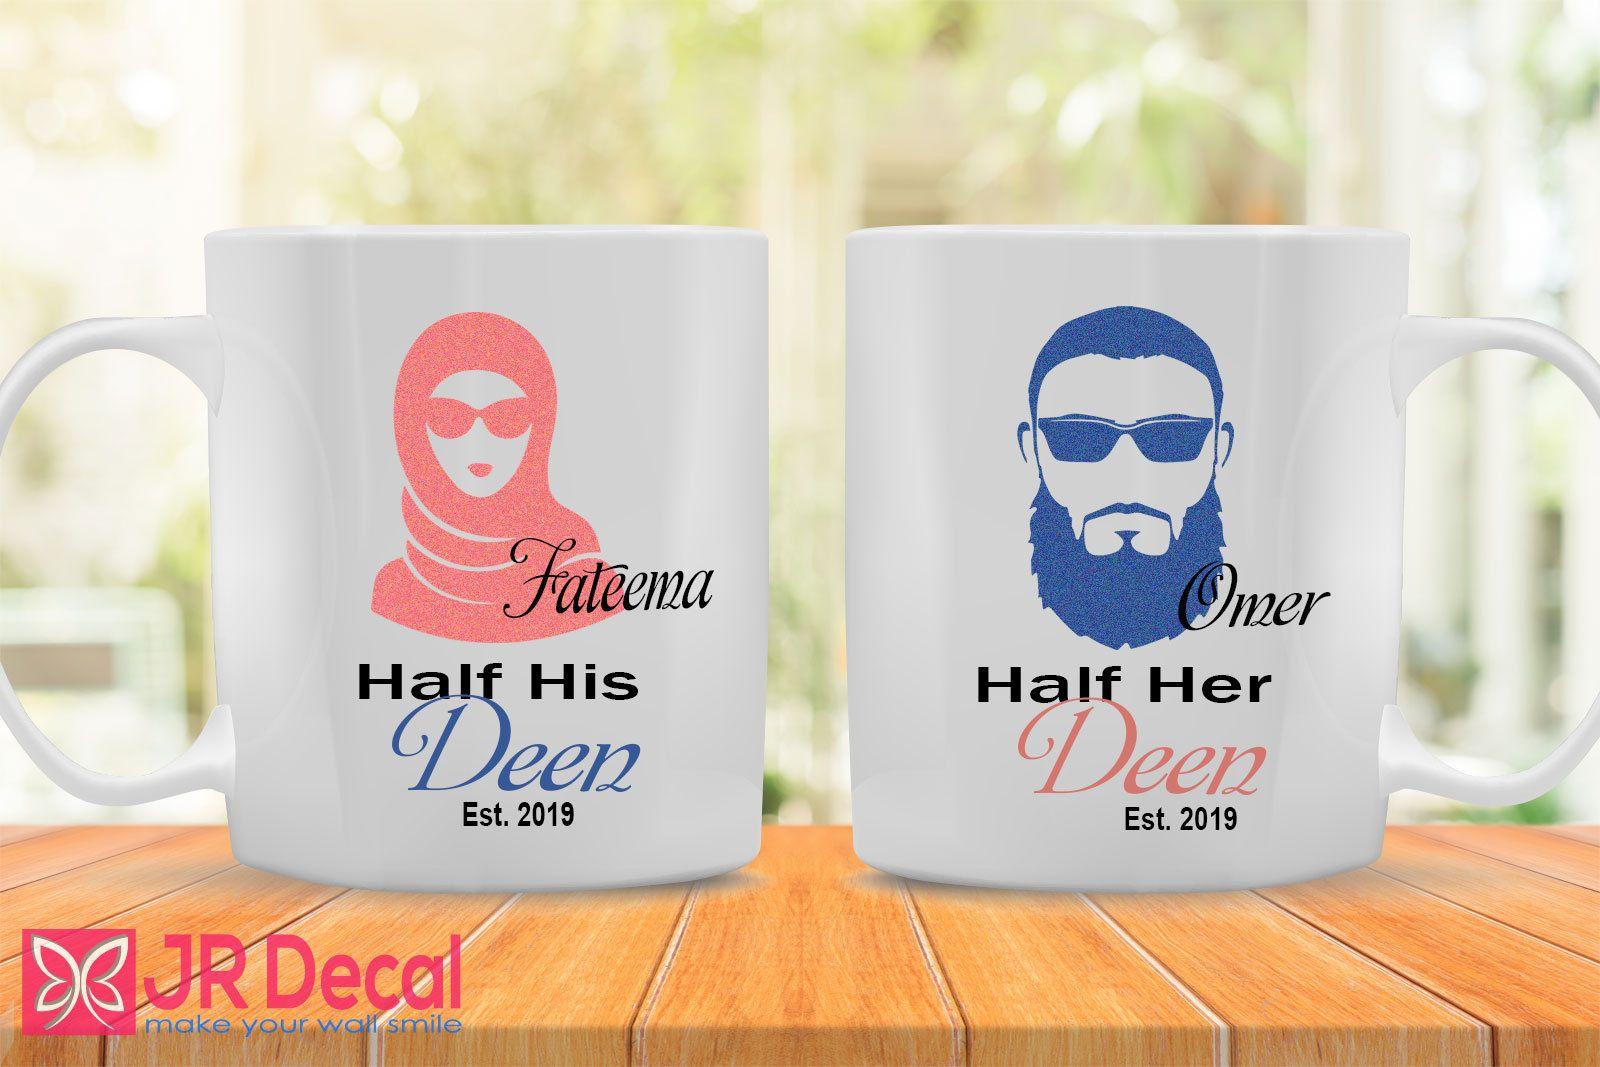 Personalised Name Half Her Deen and Half His Deen Mug set